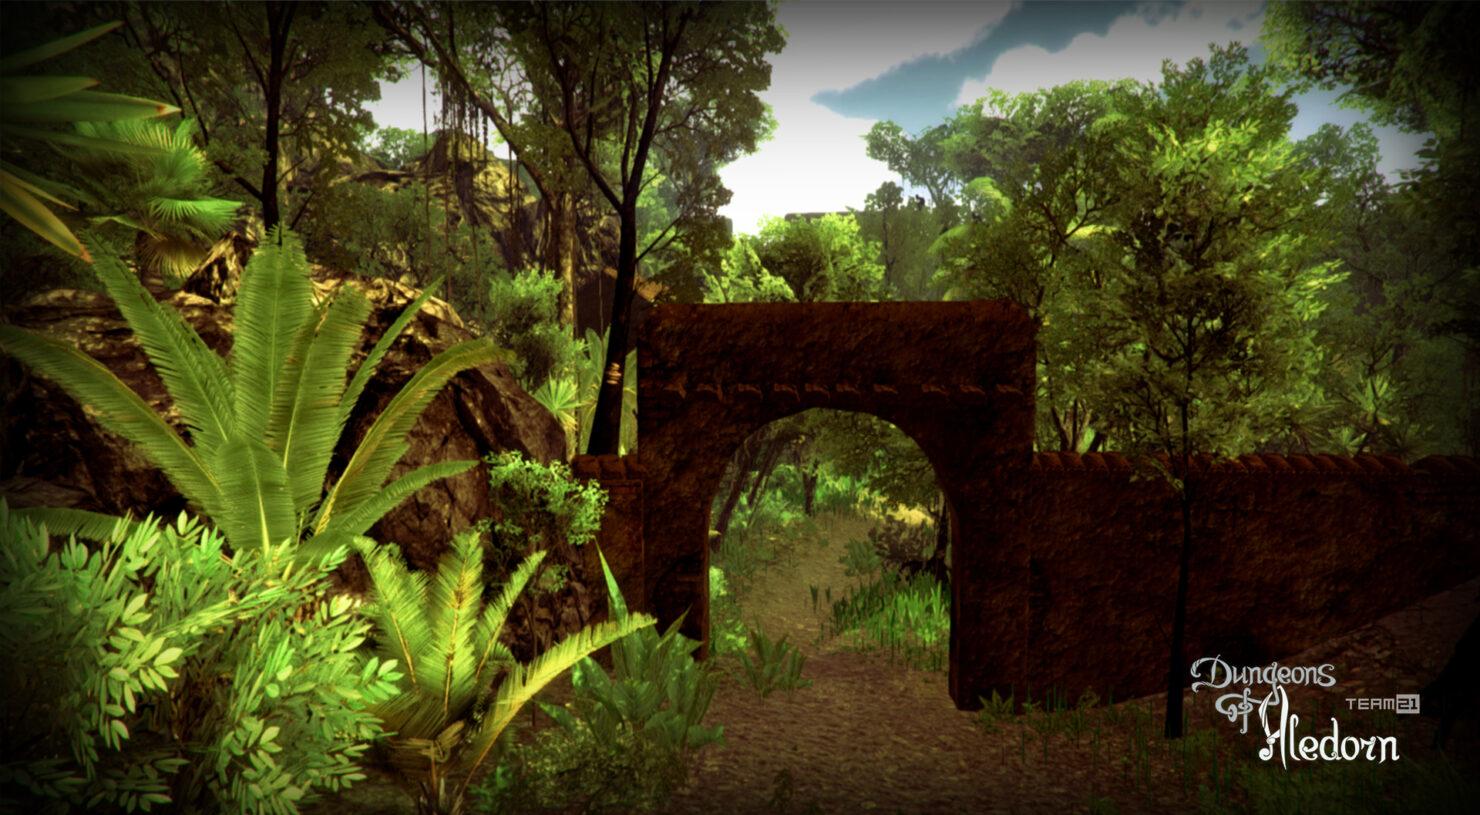 Dungeons of Aledorn